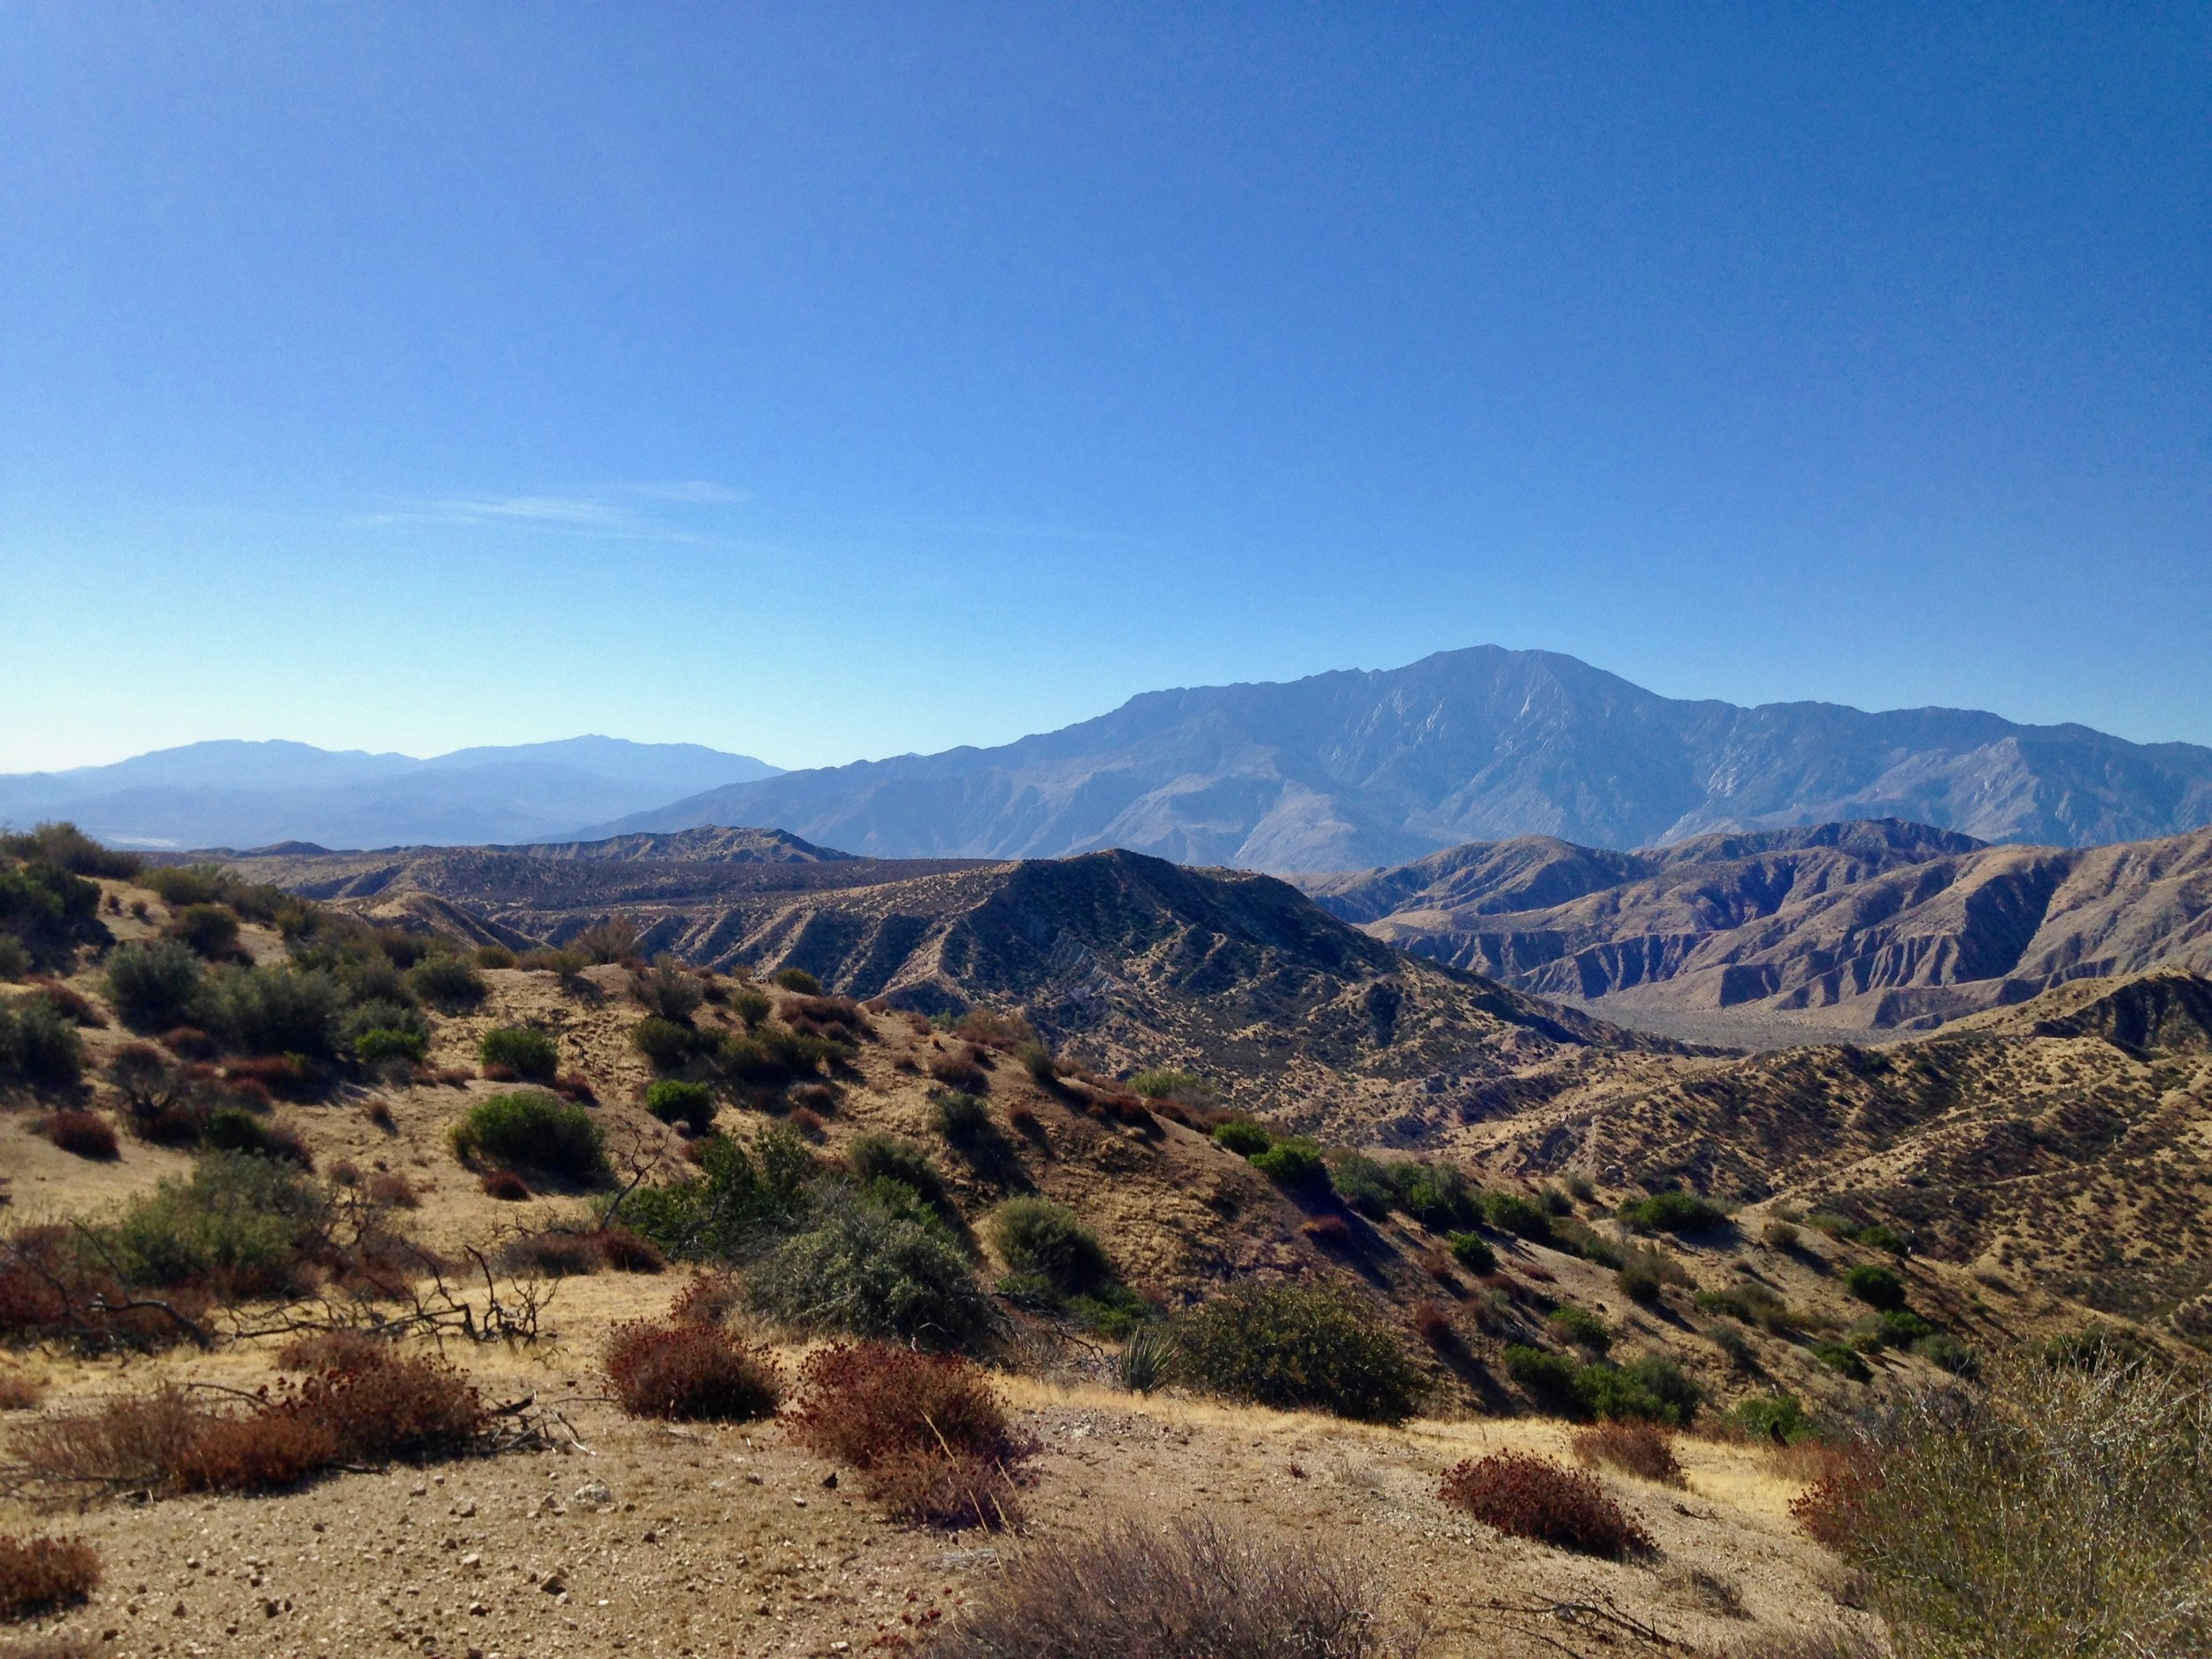 San Bernardino National Forest, CA